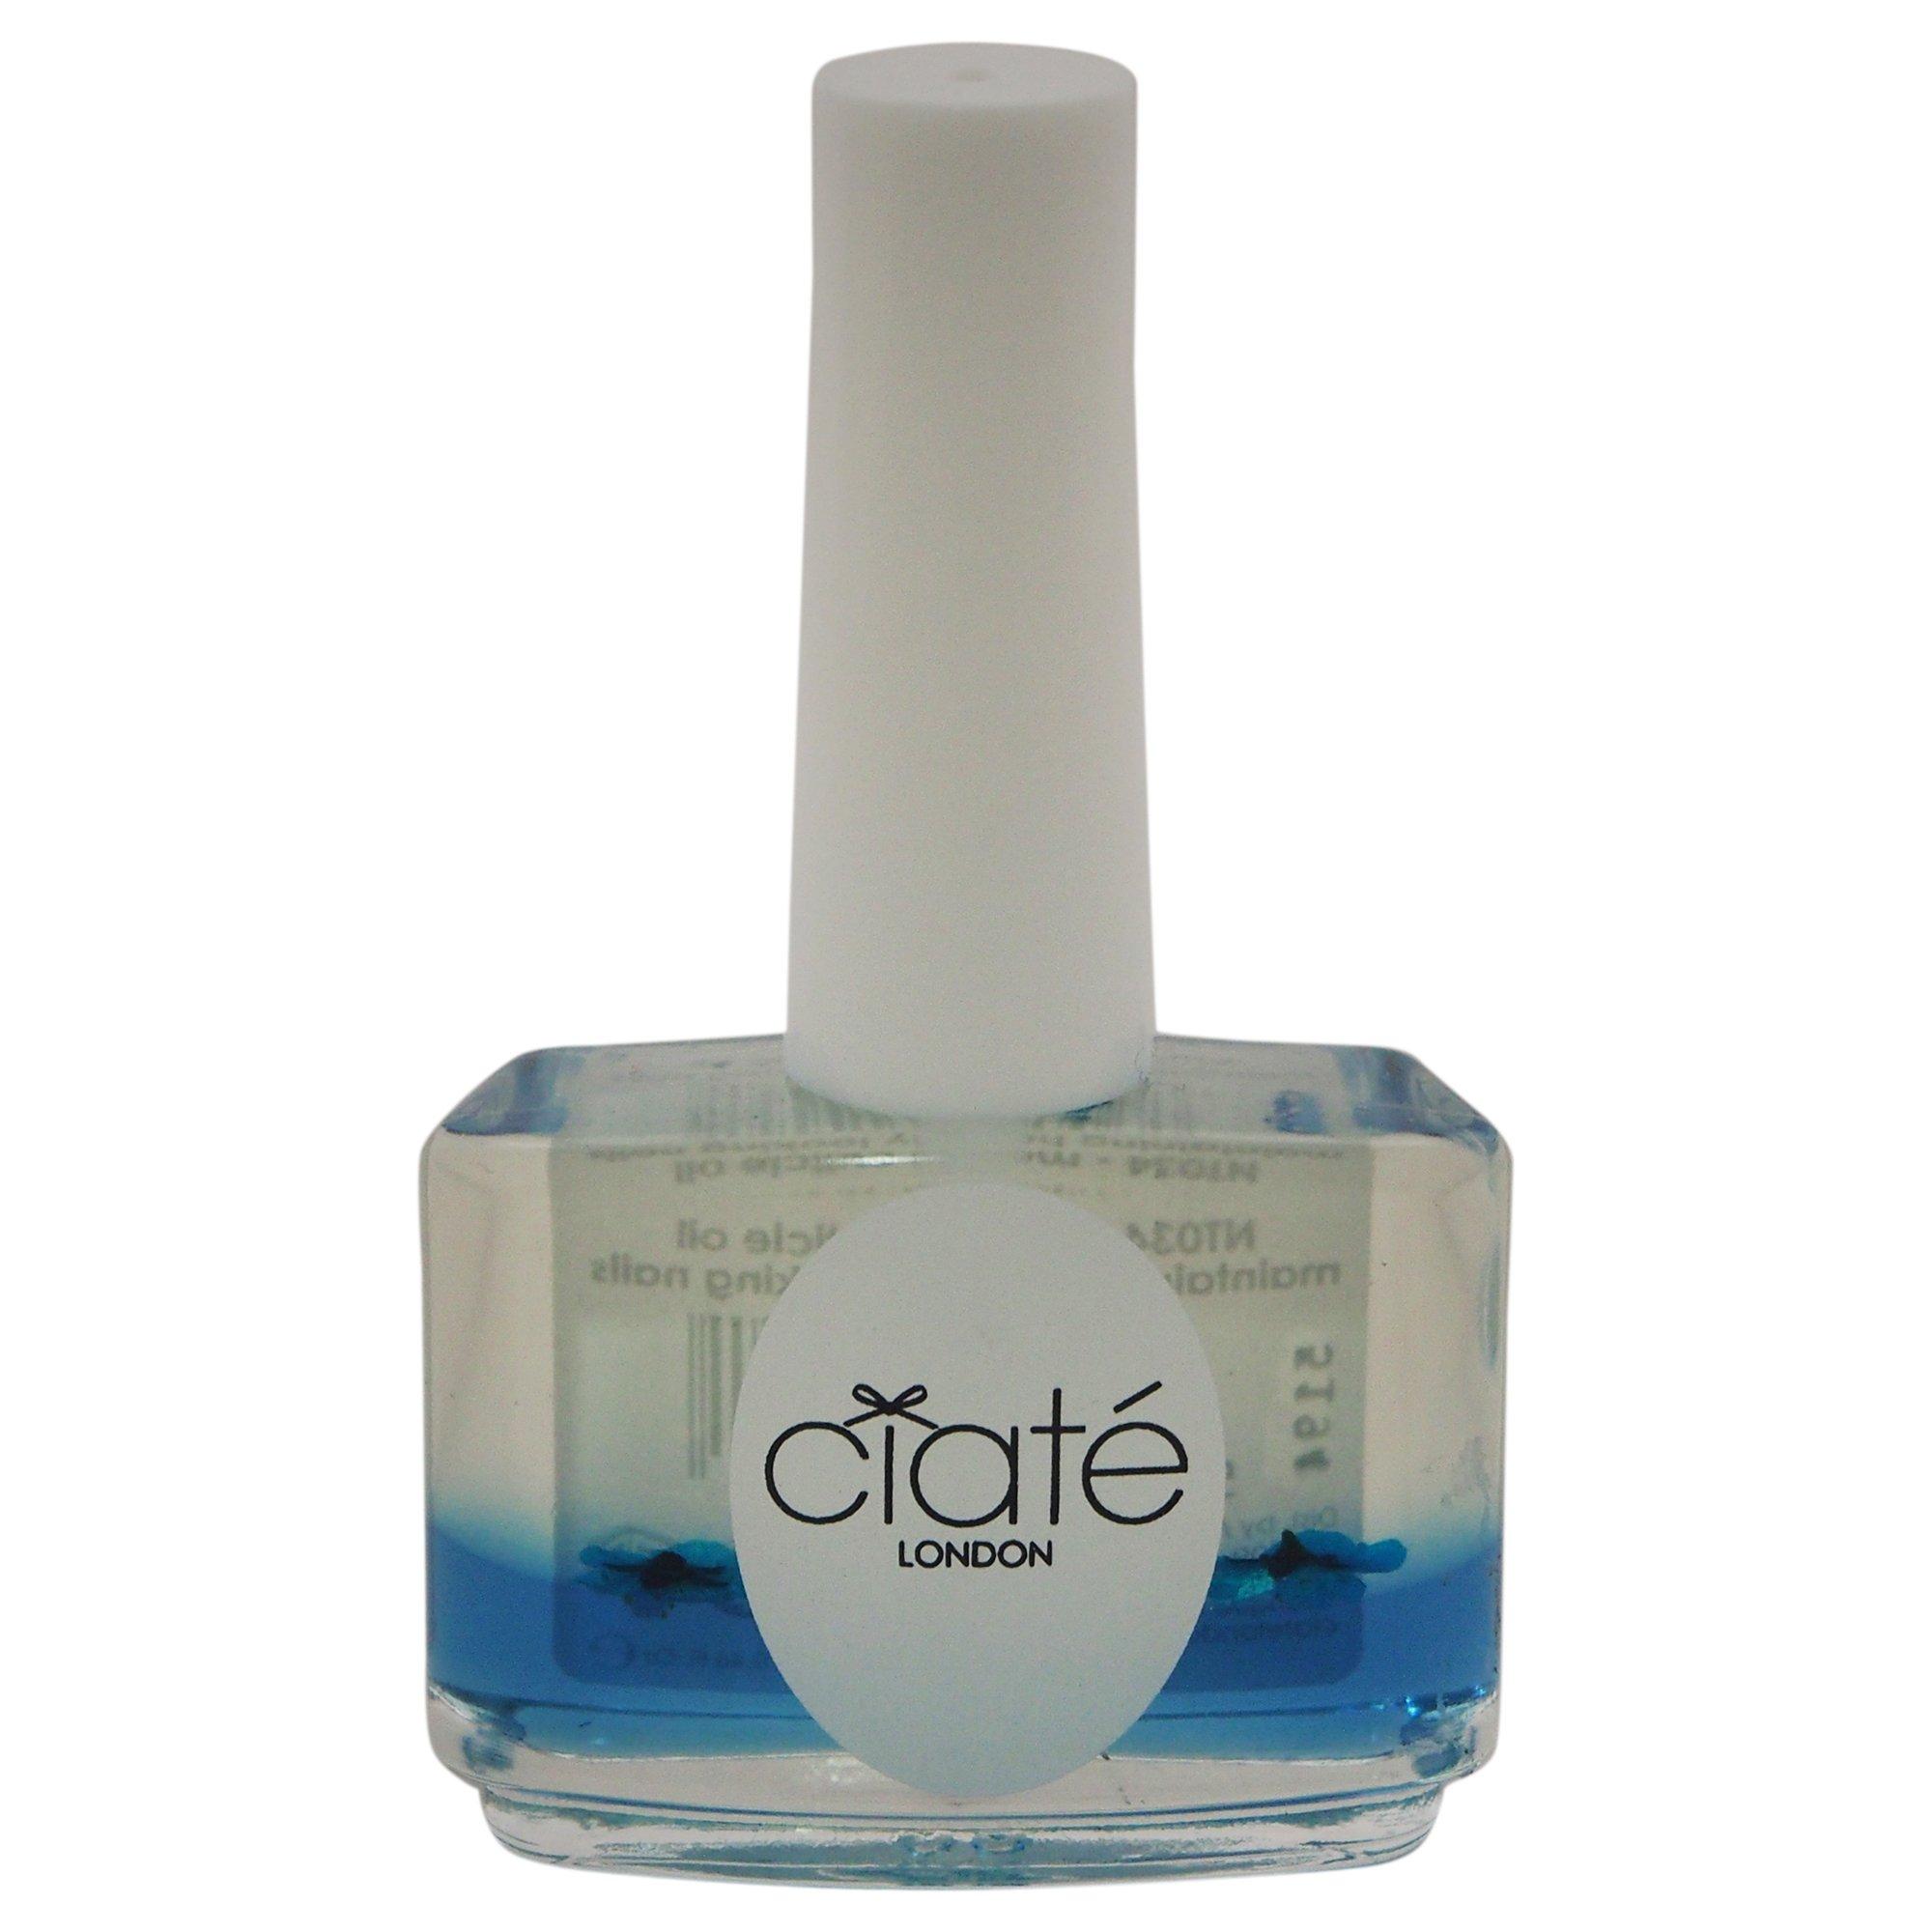 Ciate London Marula Cuticle Oil Maintaining Healthy Looking Women's Nail Polish, 0.46 Ounce